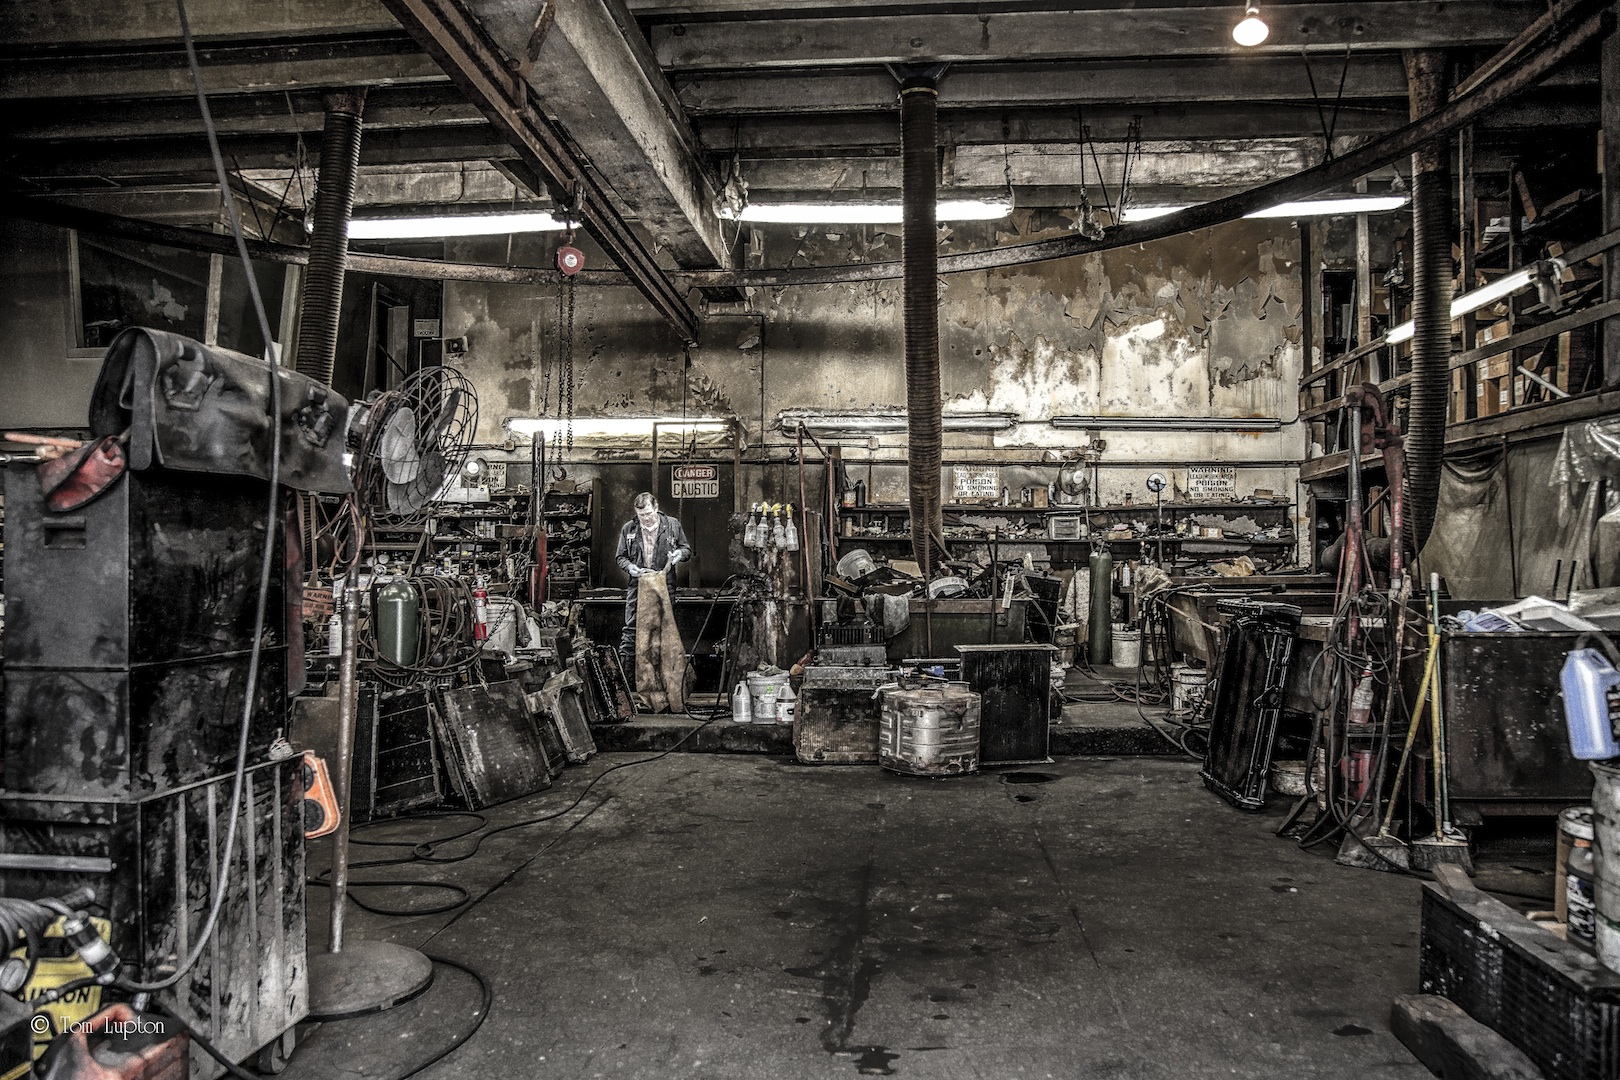 Tom_Lupton_Photography_Shop.jpg